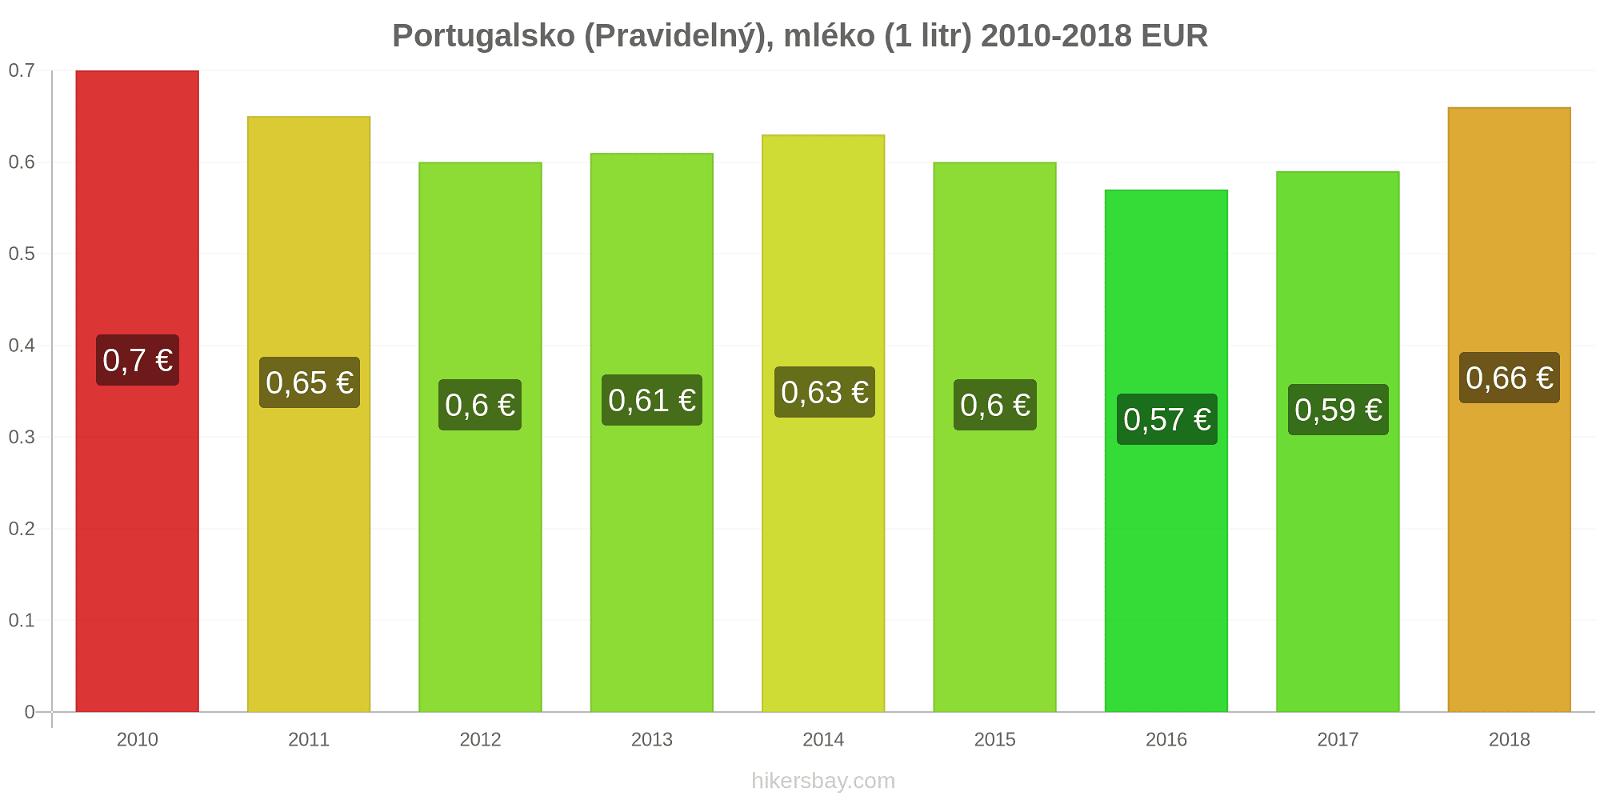 Portugalsko změny cen (Pravidelný), mléko (1 litr) hikersbay.com